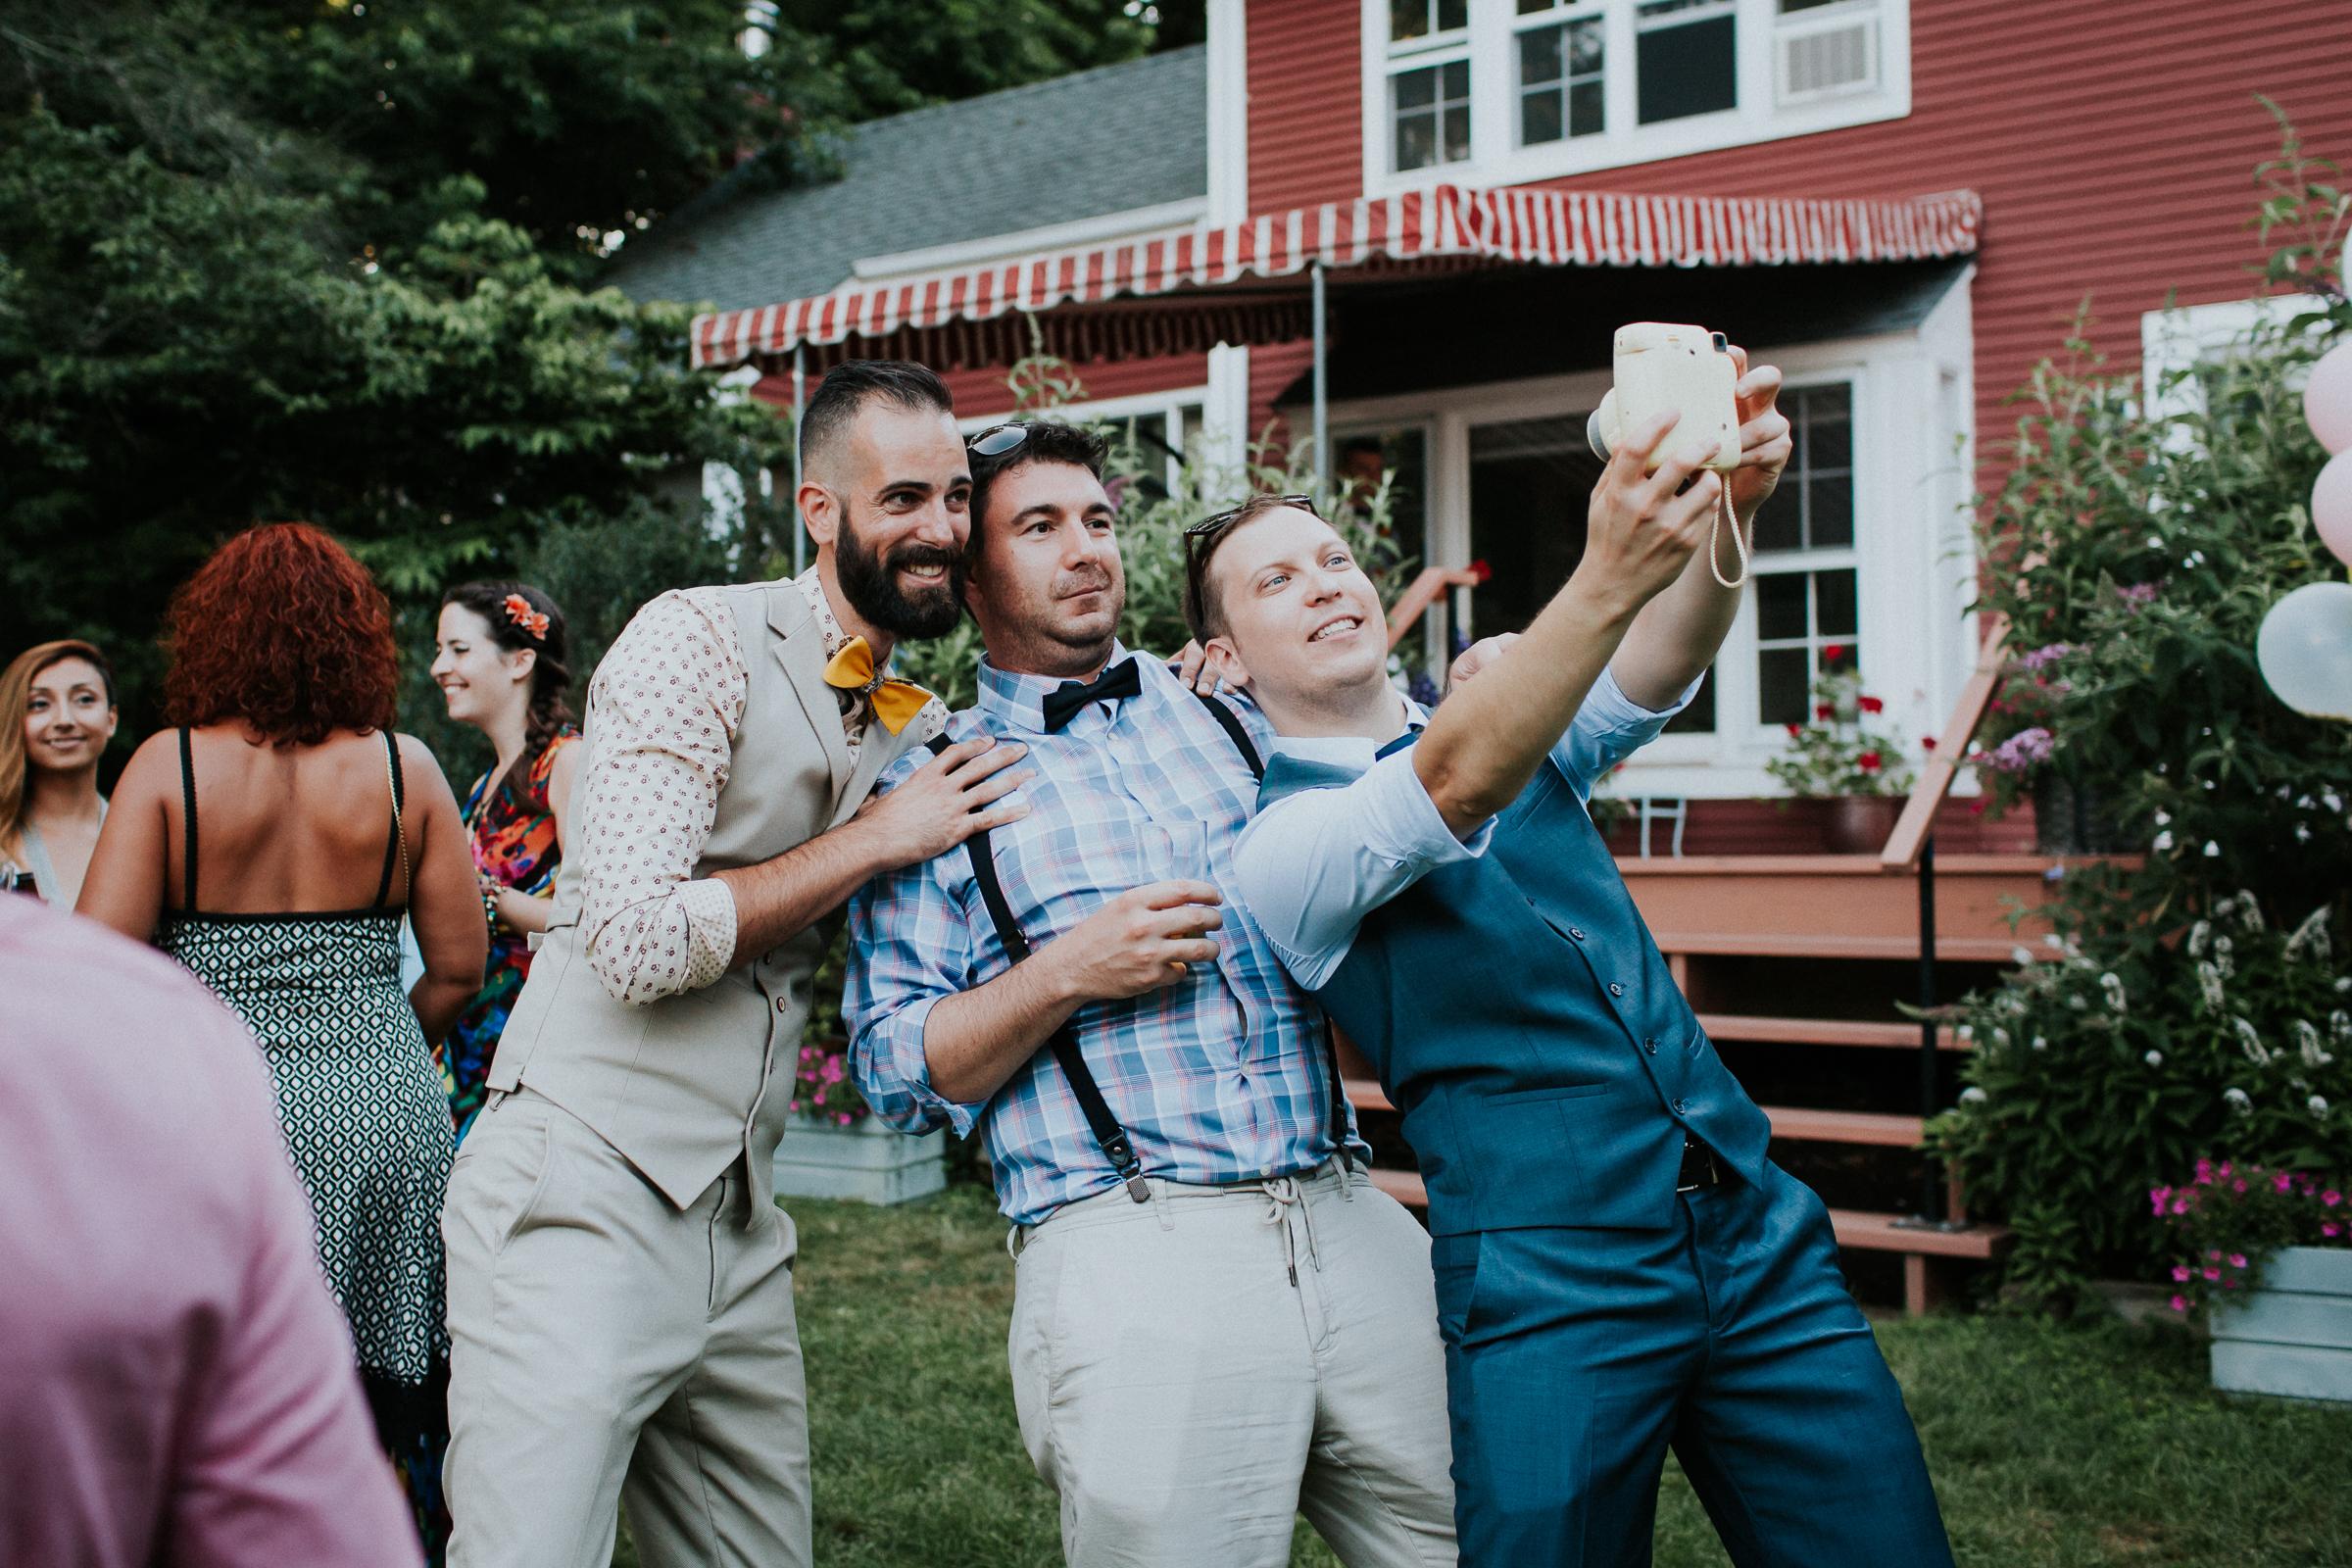 Backyard-Intimate-Adventurous-Destination-Wedding-Darien-Connecticut-Documentary-Wedding-Photography-167.jpg